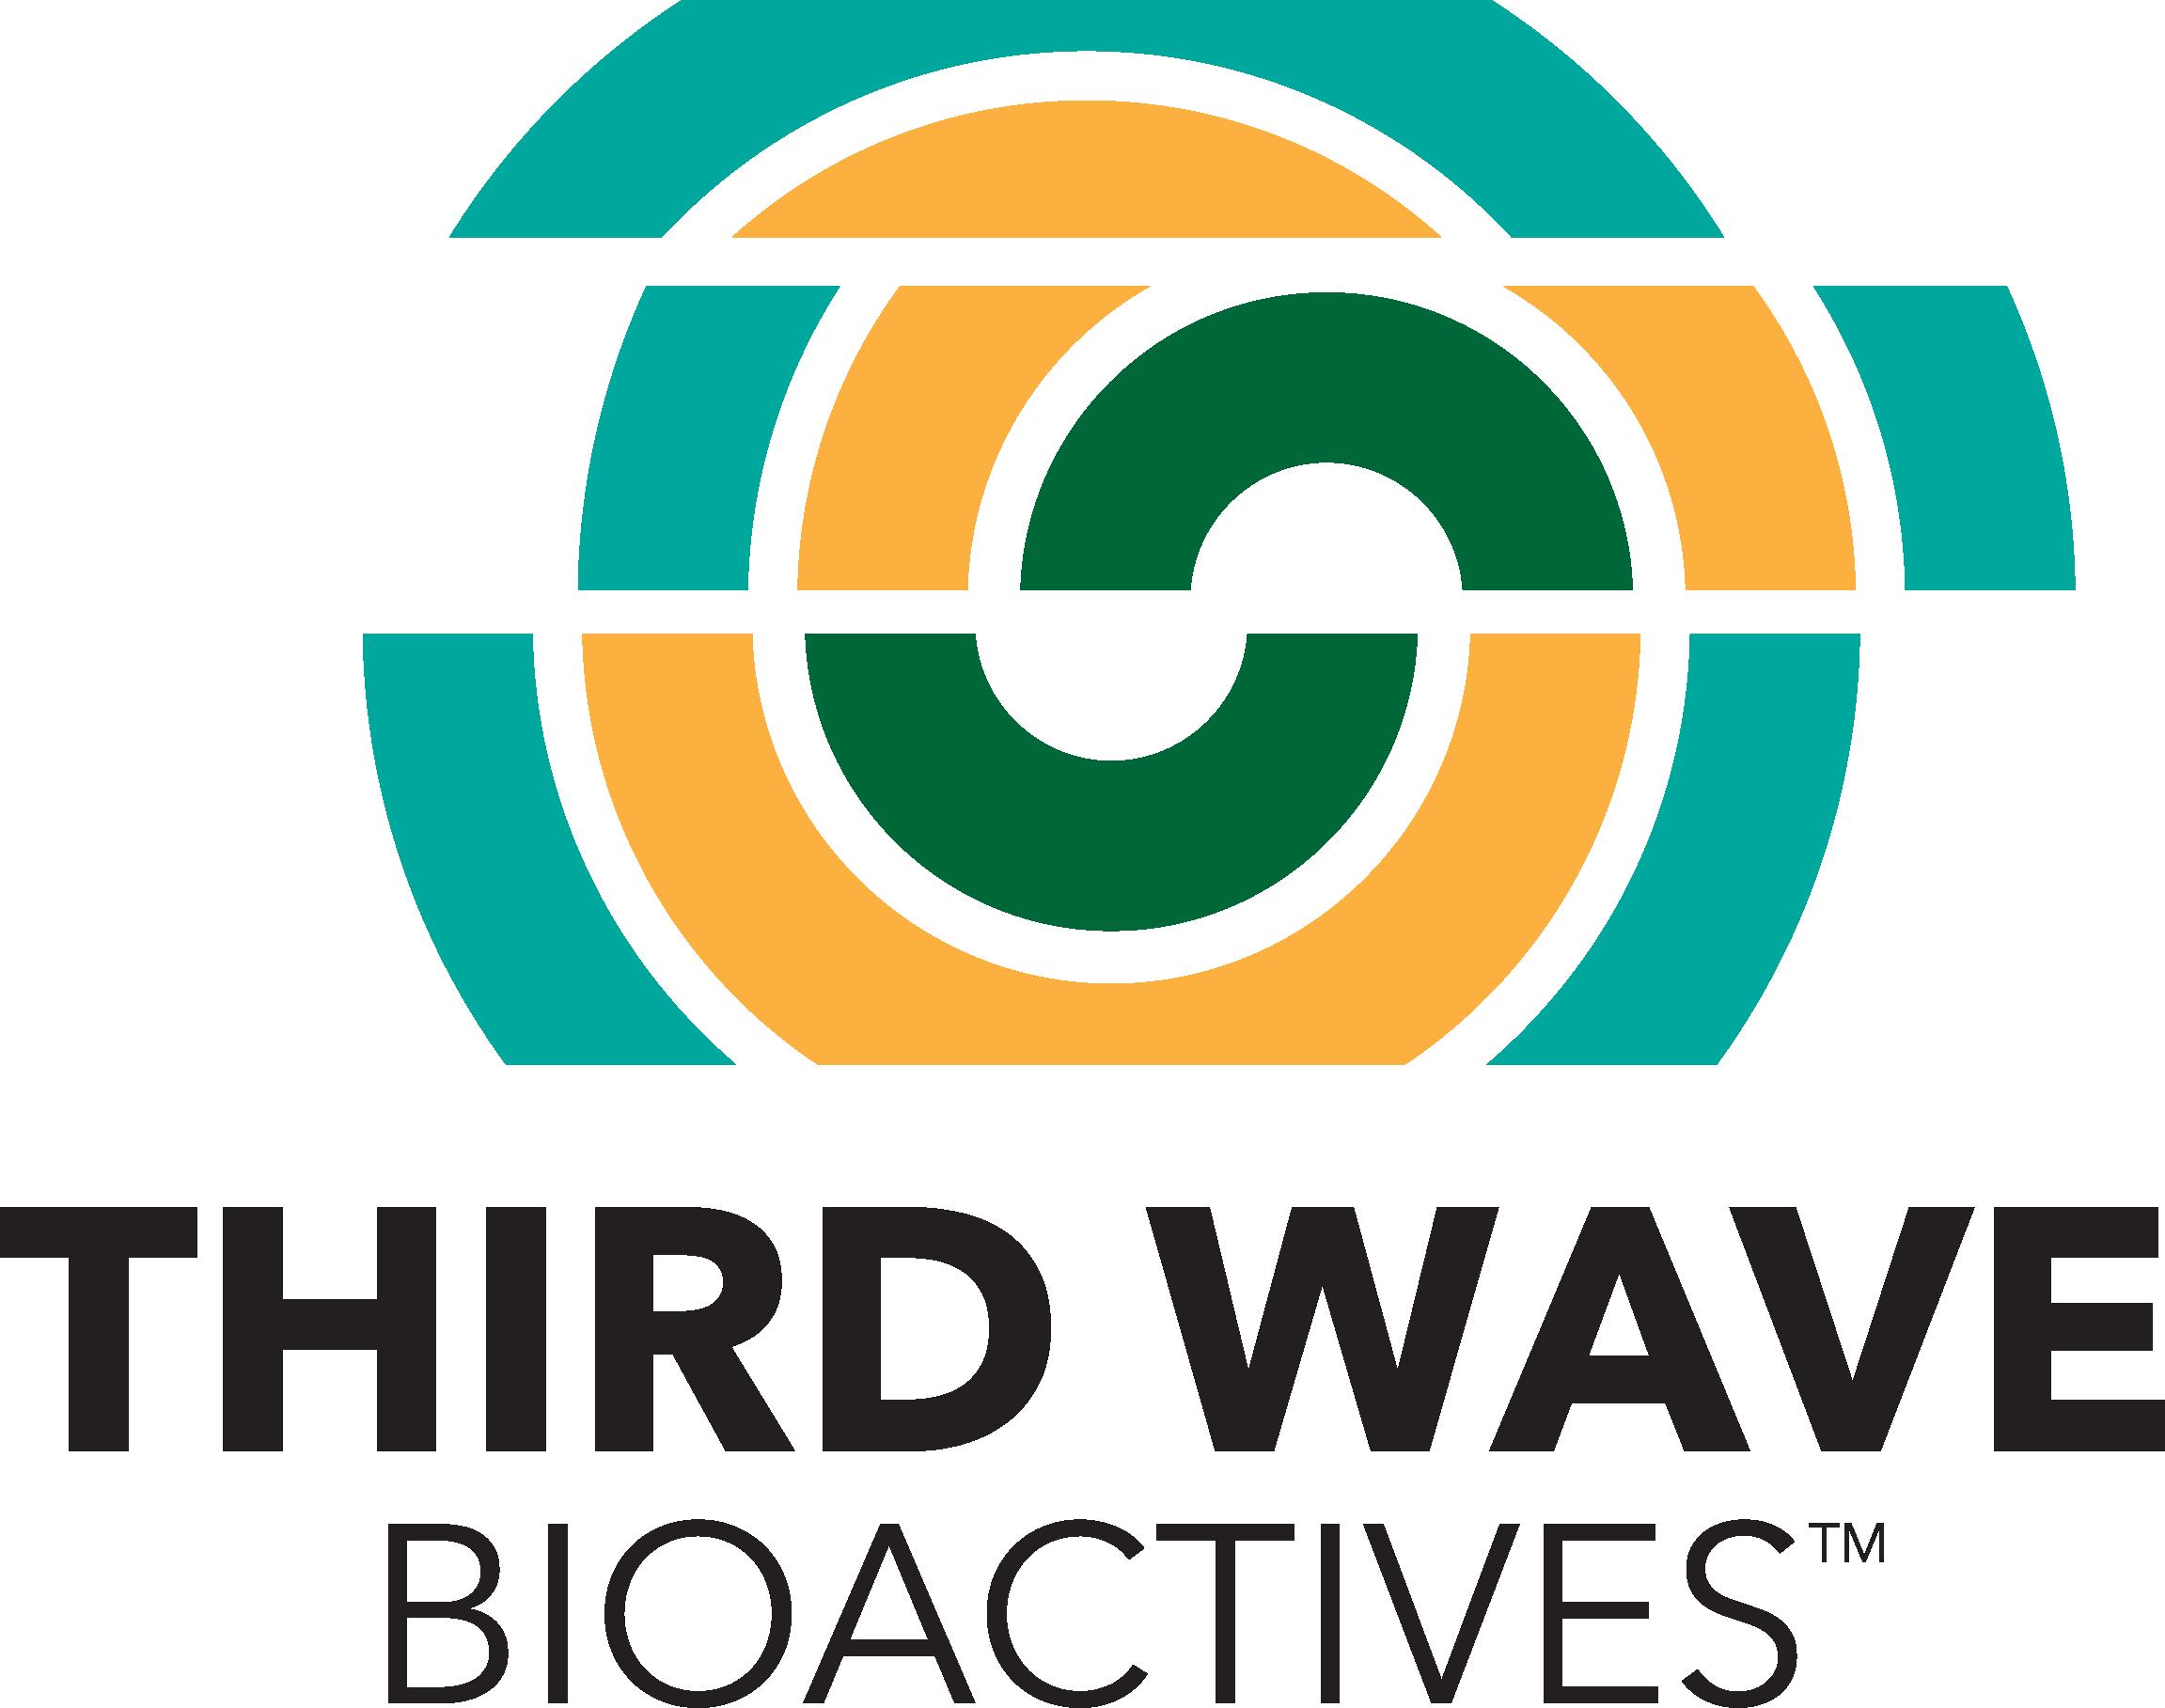 Thirdwave logo